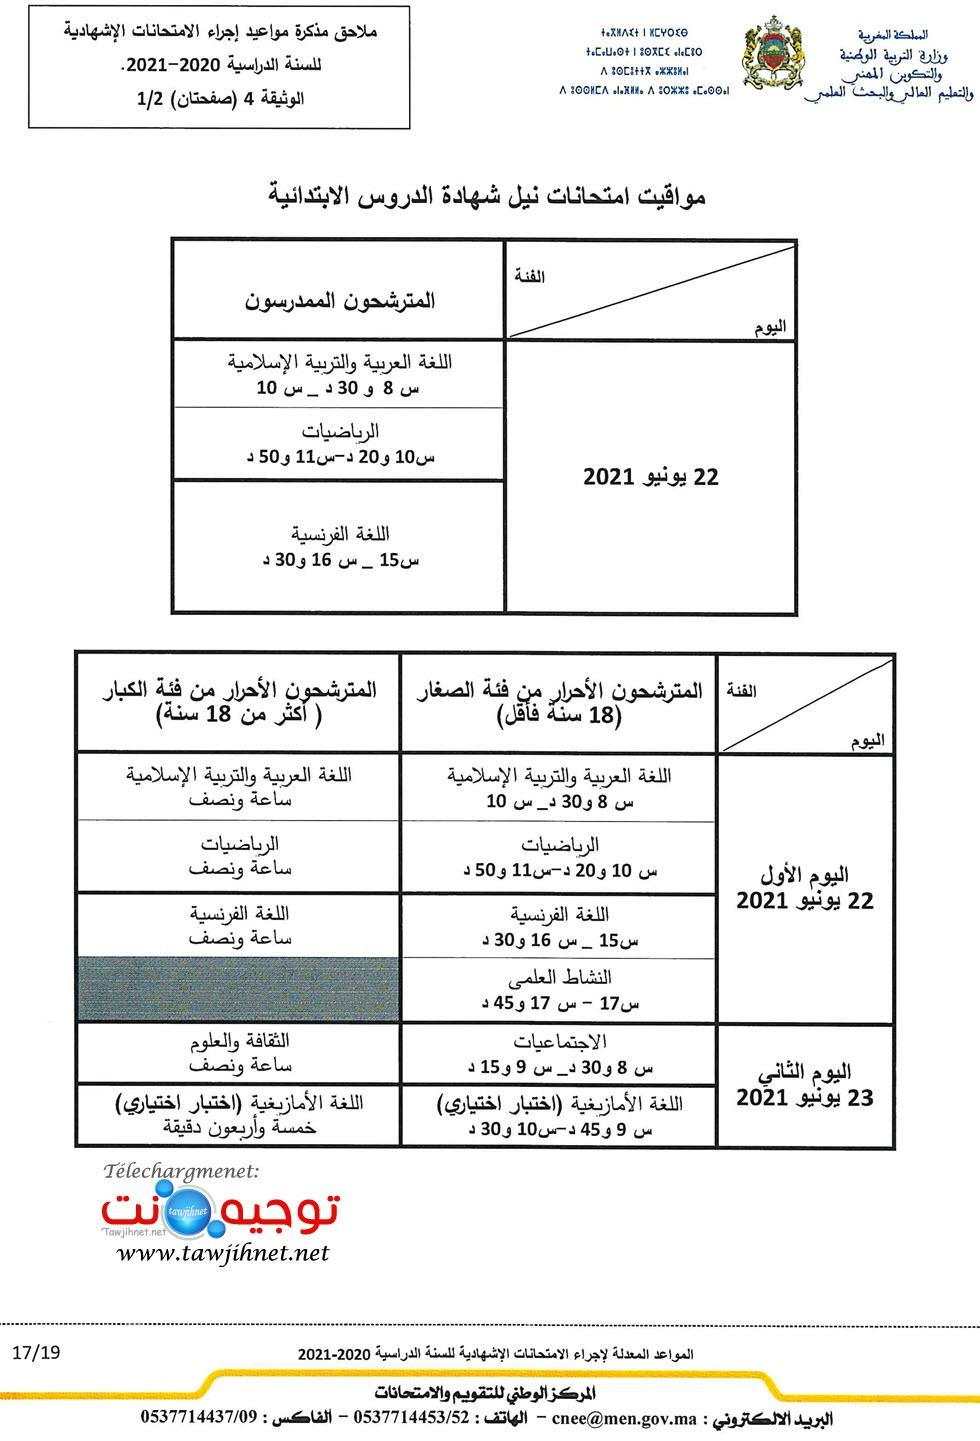 examen-2021-national-regional-provincial_Page_17.jpg